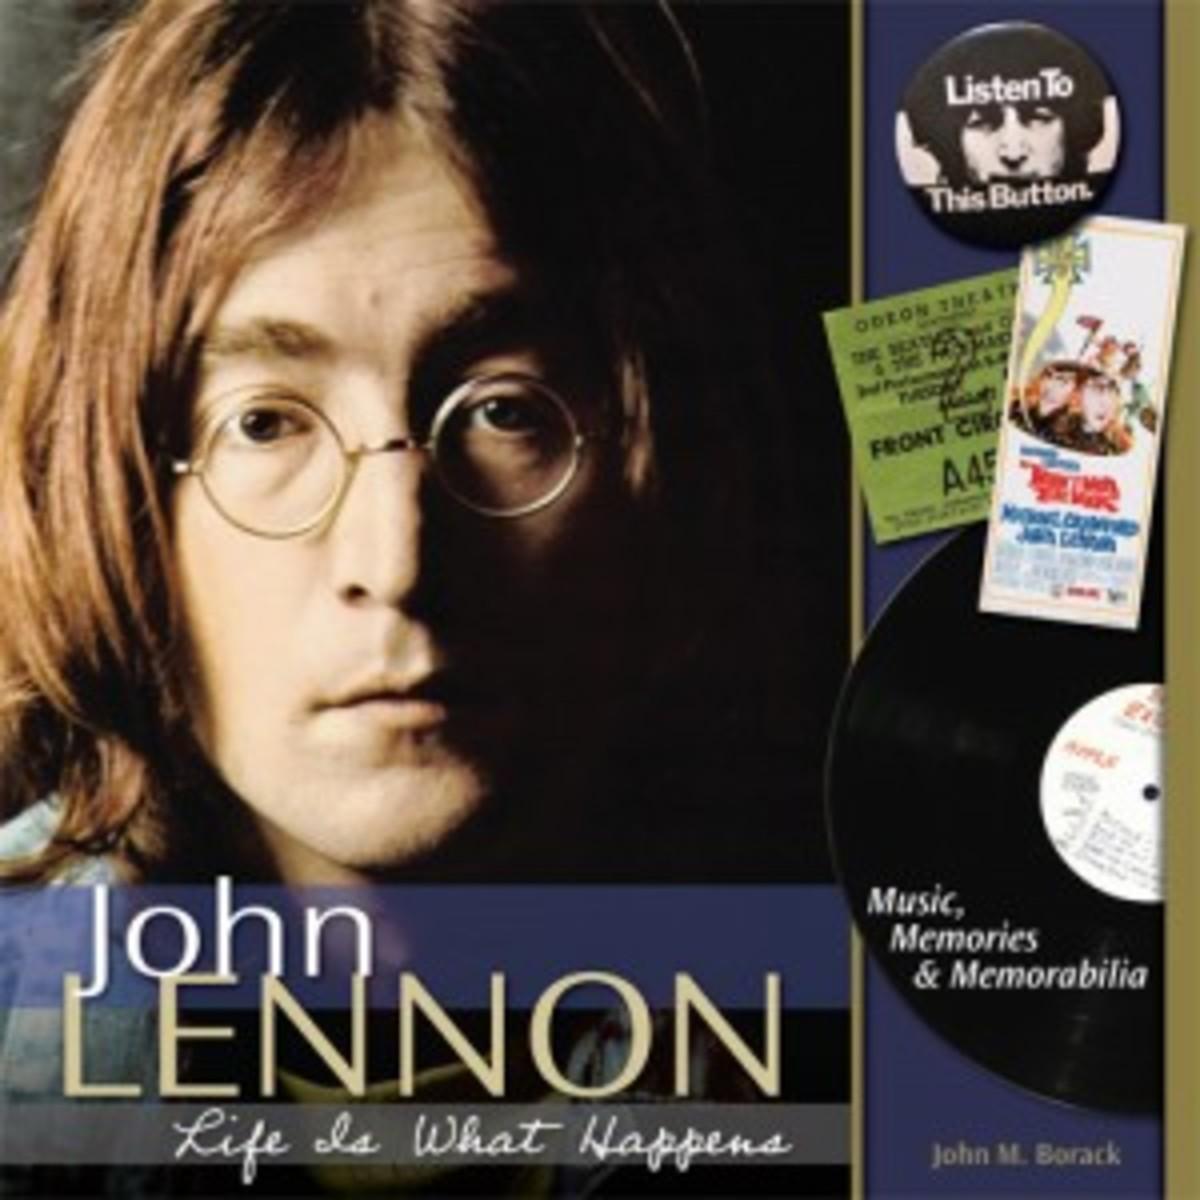 JohnLennon_Z7968